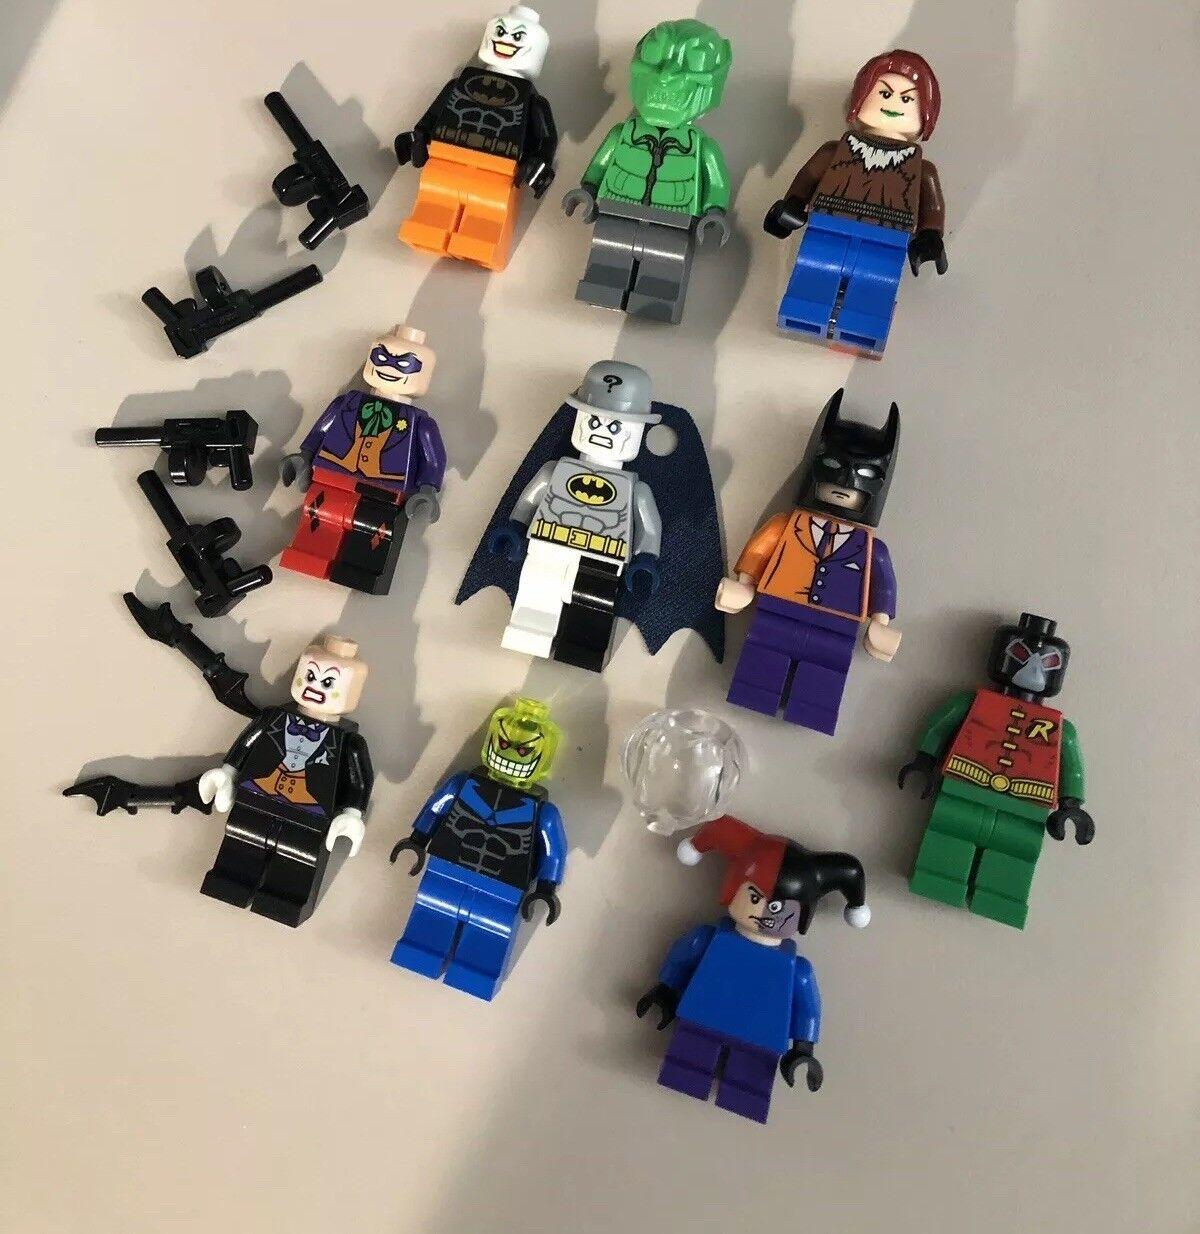 Lego Batman Randomized Figure Lot 7783 Kids Toys Superheros